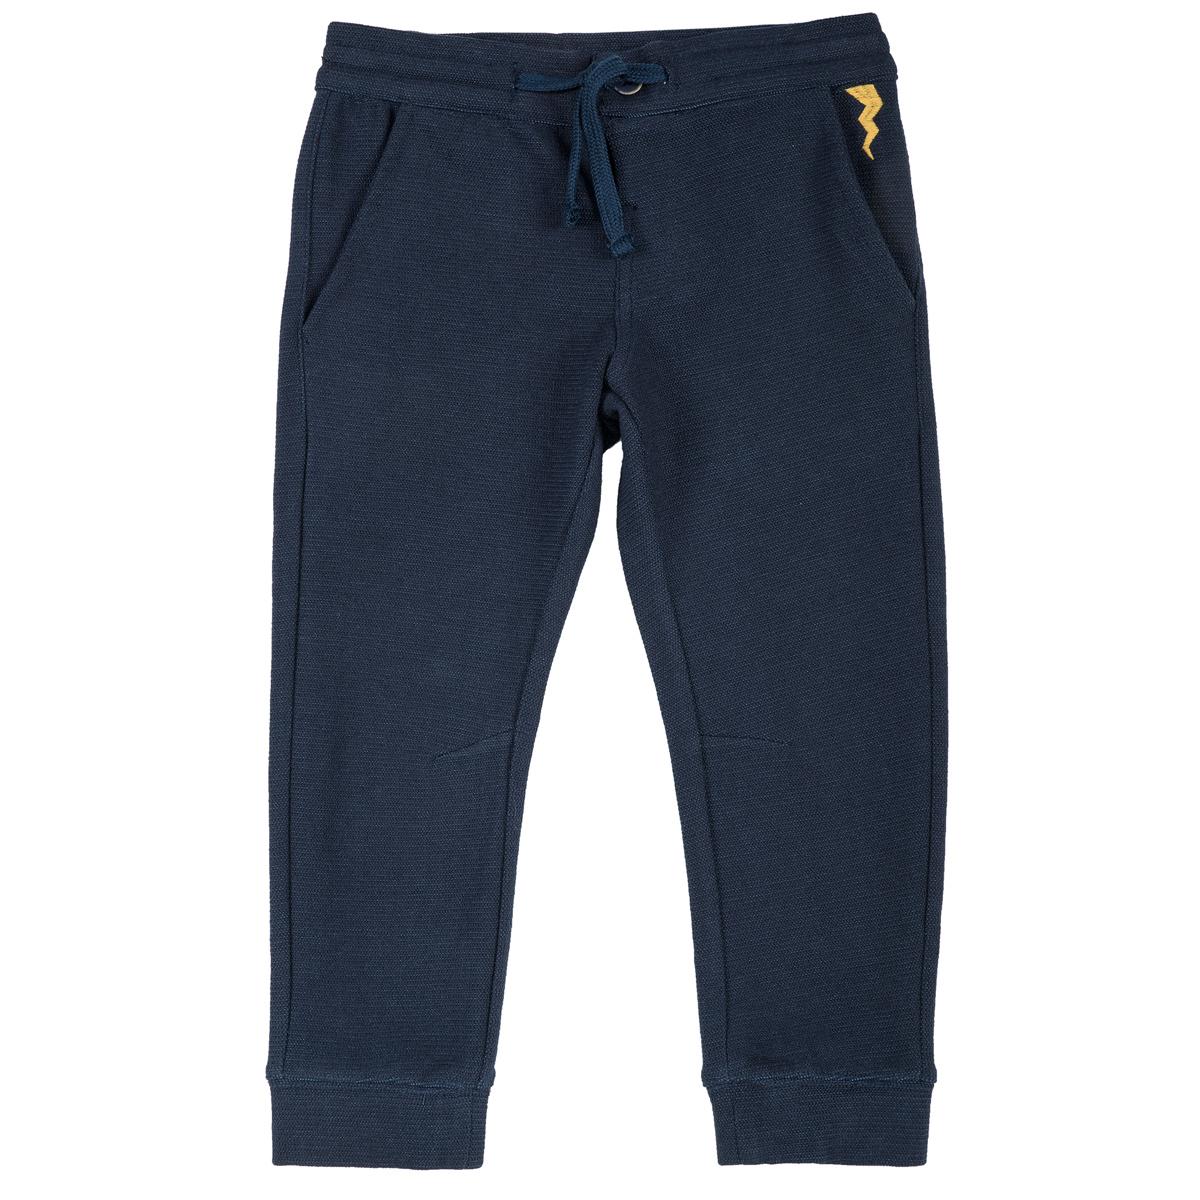 Pantalon lung copii Chicco, albastru inchis, 24947